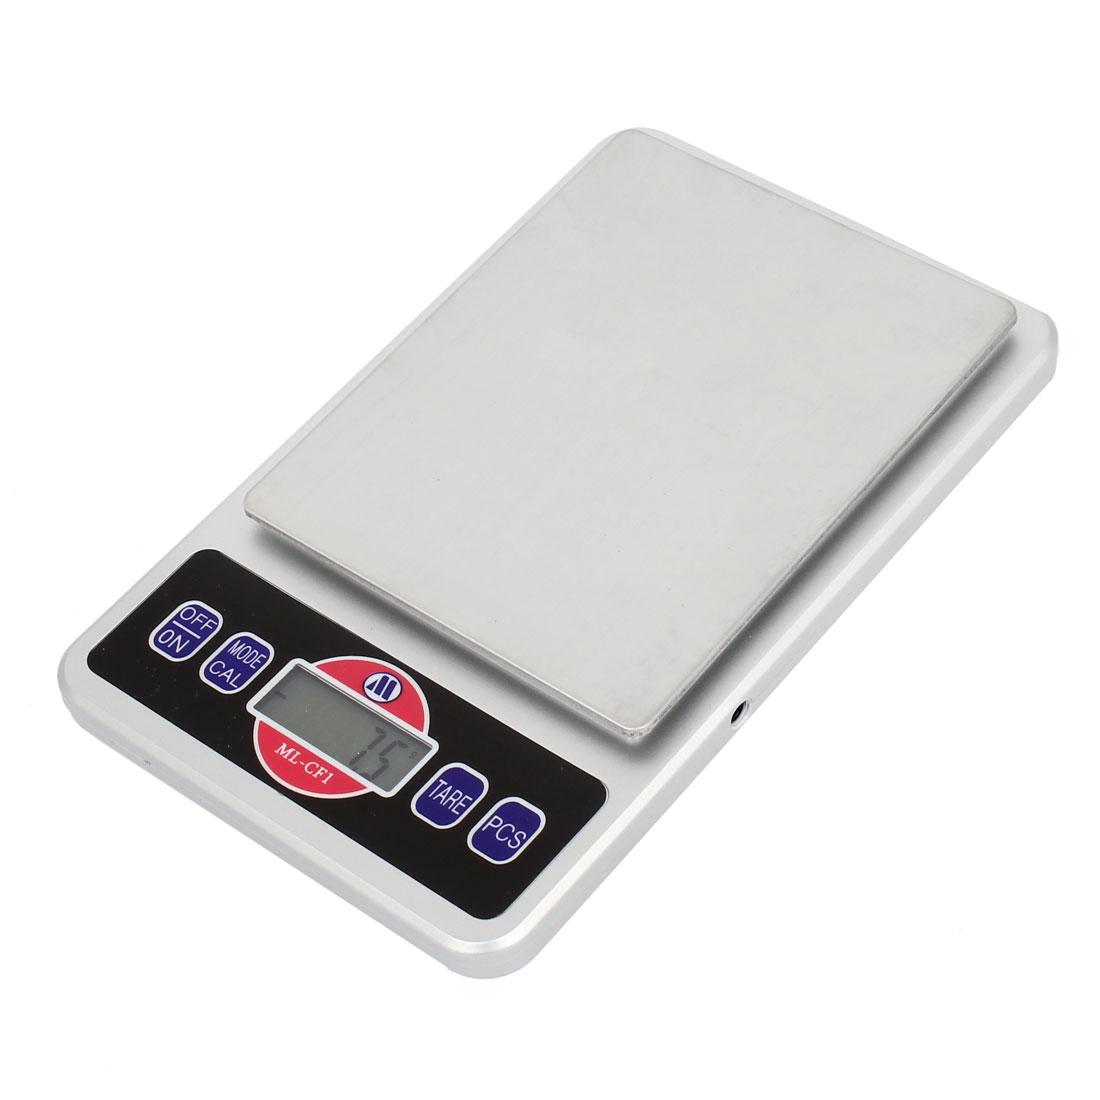 0.1g x 2000g Jewelry Weight Balance Digital Pocket Scale Silver Tone